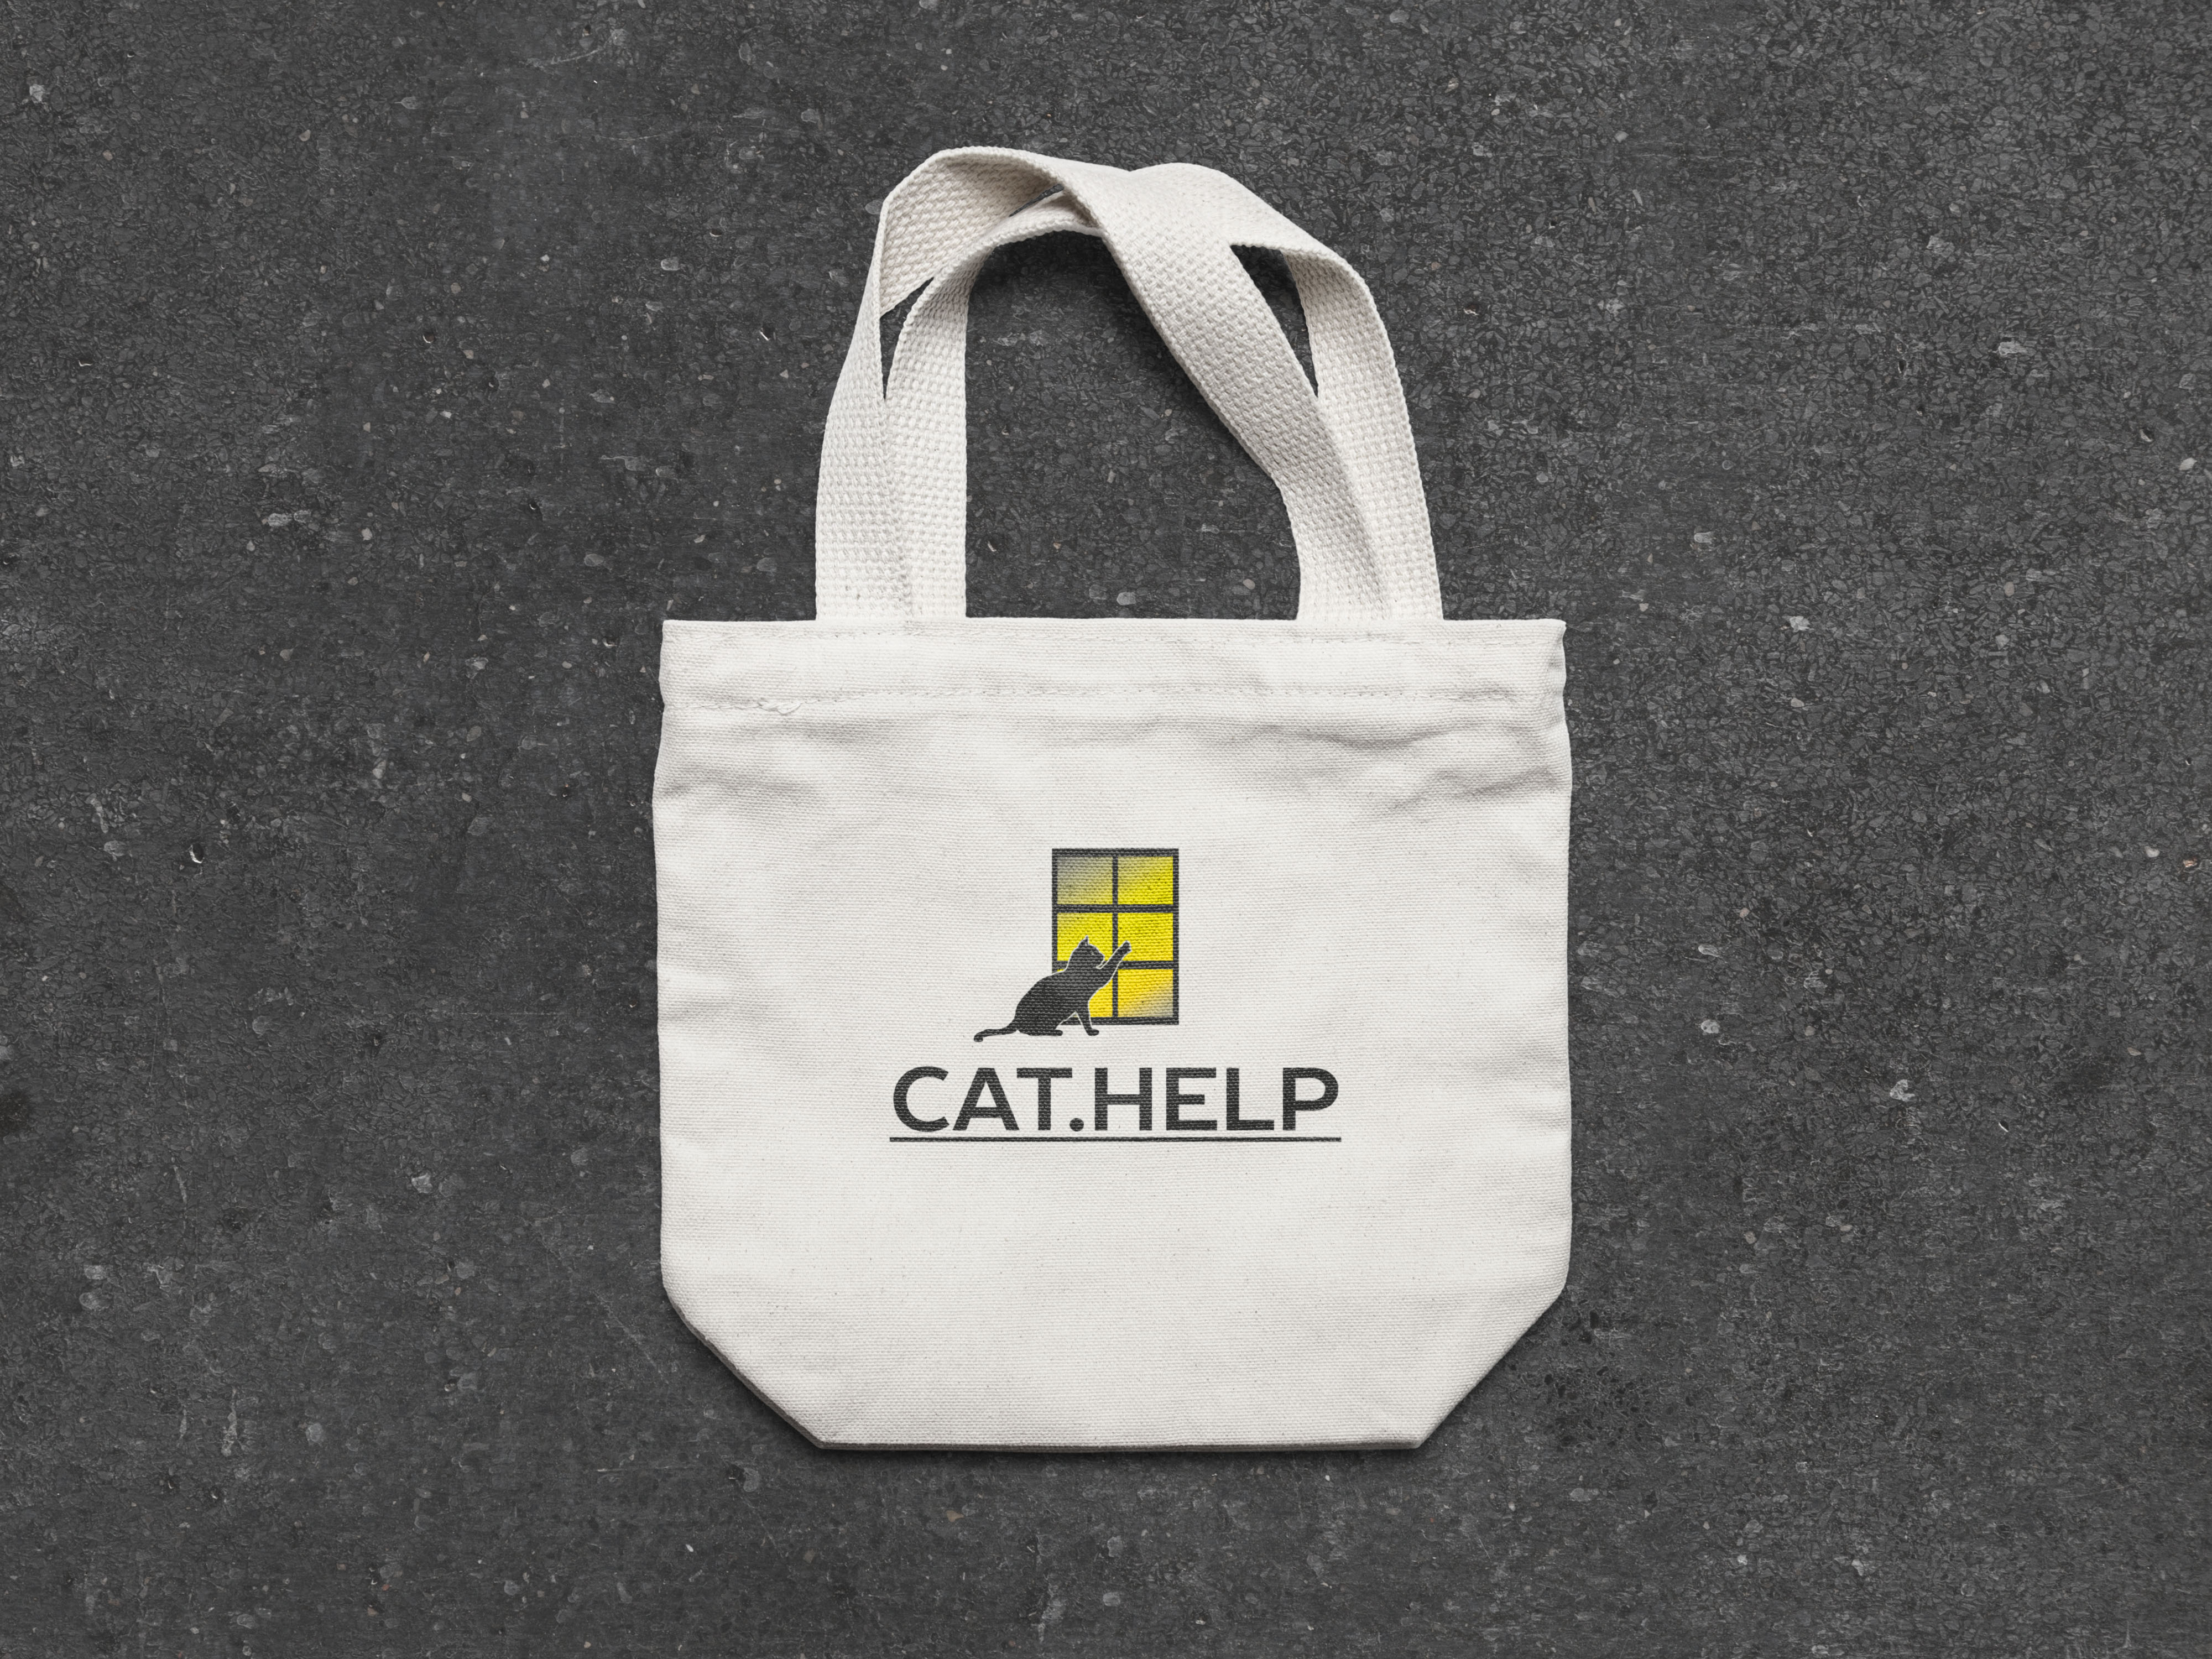 логотип для сайта и группы вк - cat.help фото f_76159e471f53be7f.jpg